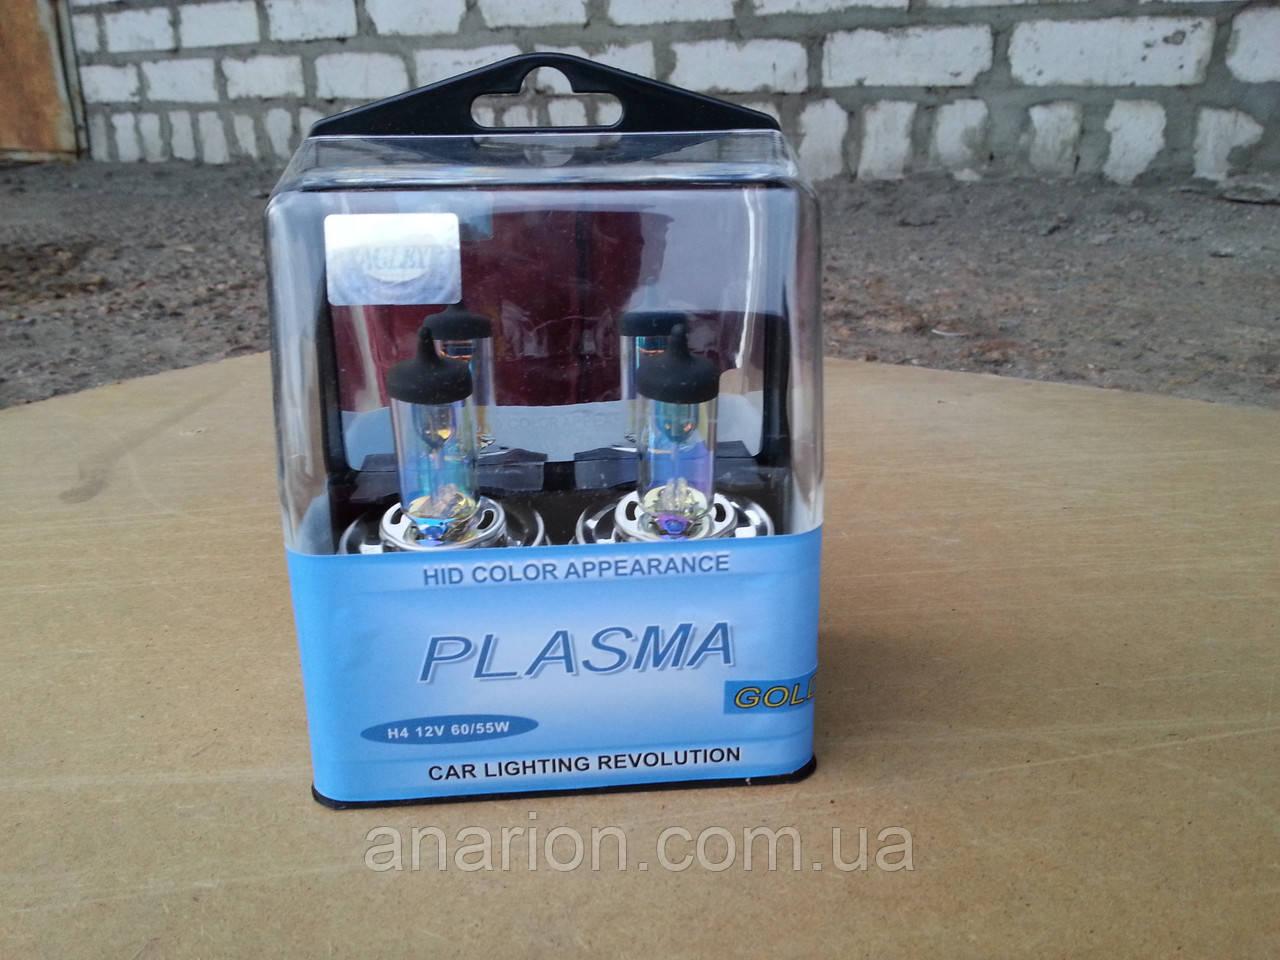 Автолампа H4 12v 60/55w P45T Plazma Gold на ВАЗ 2101- для дождливой погоды!